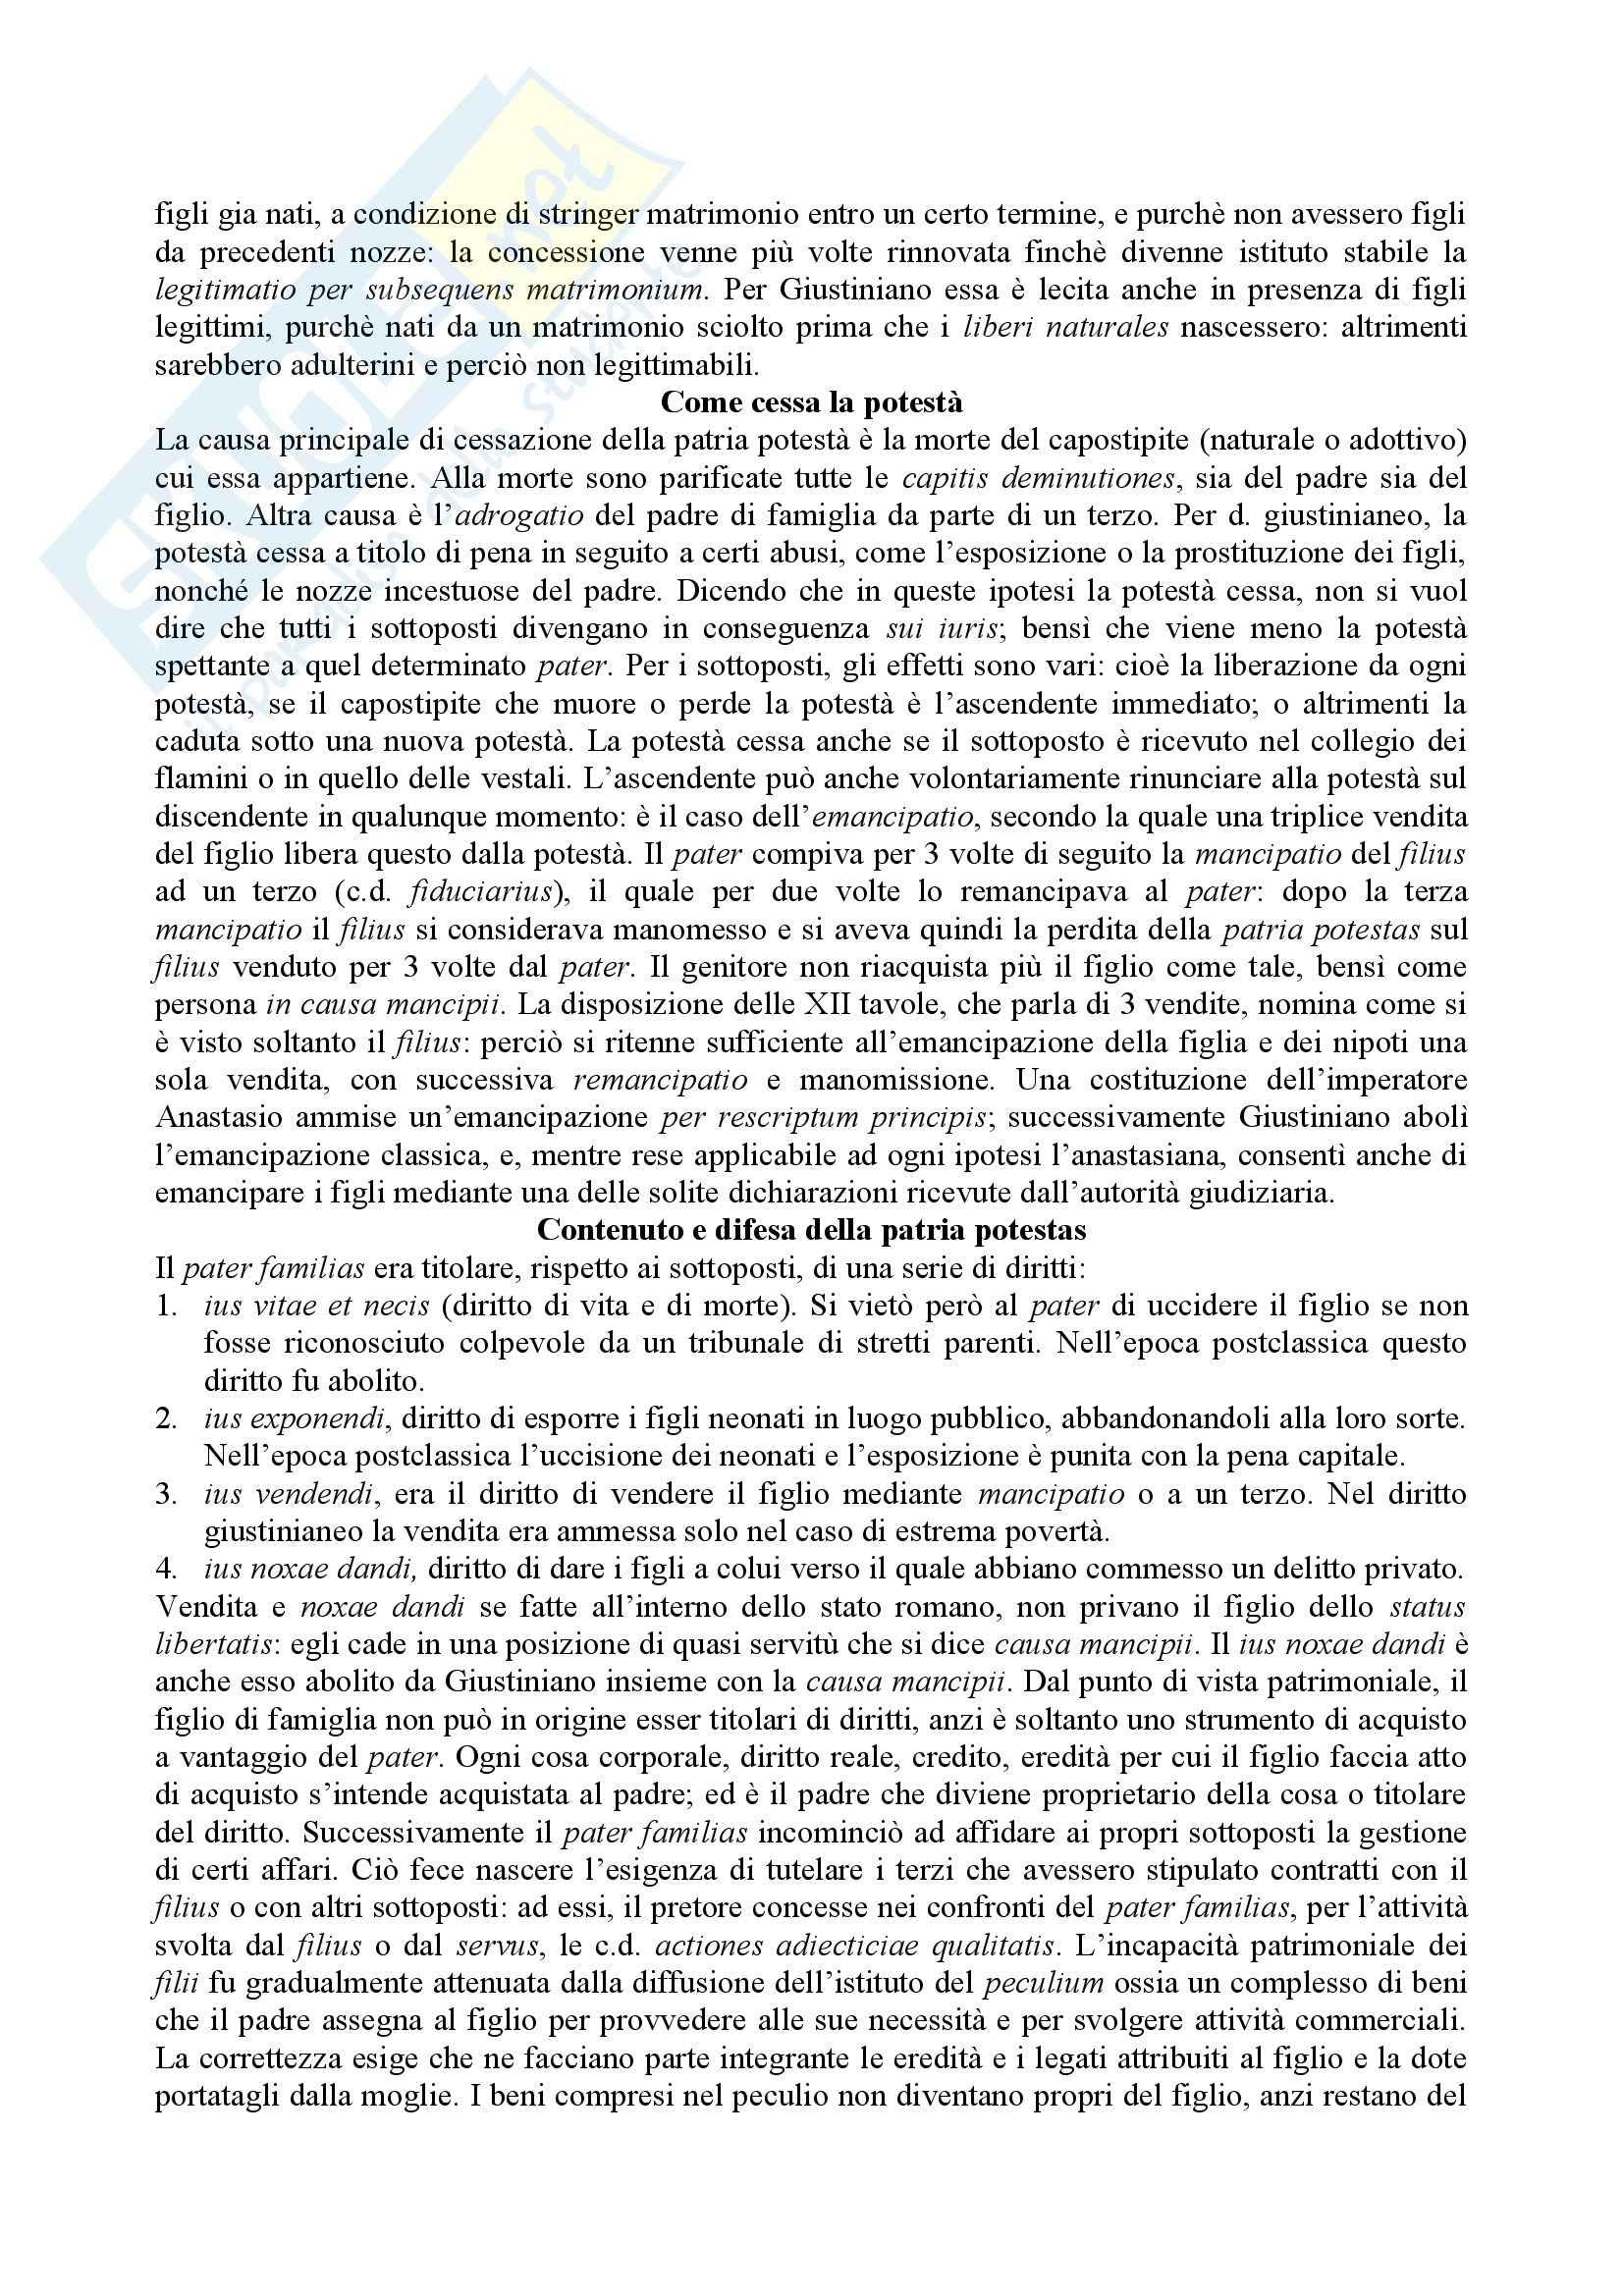 Diritto romano - la patria potestas Pag. 2